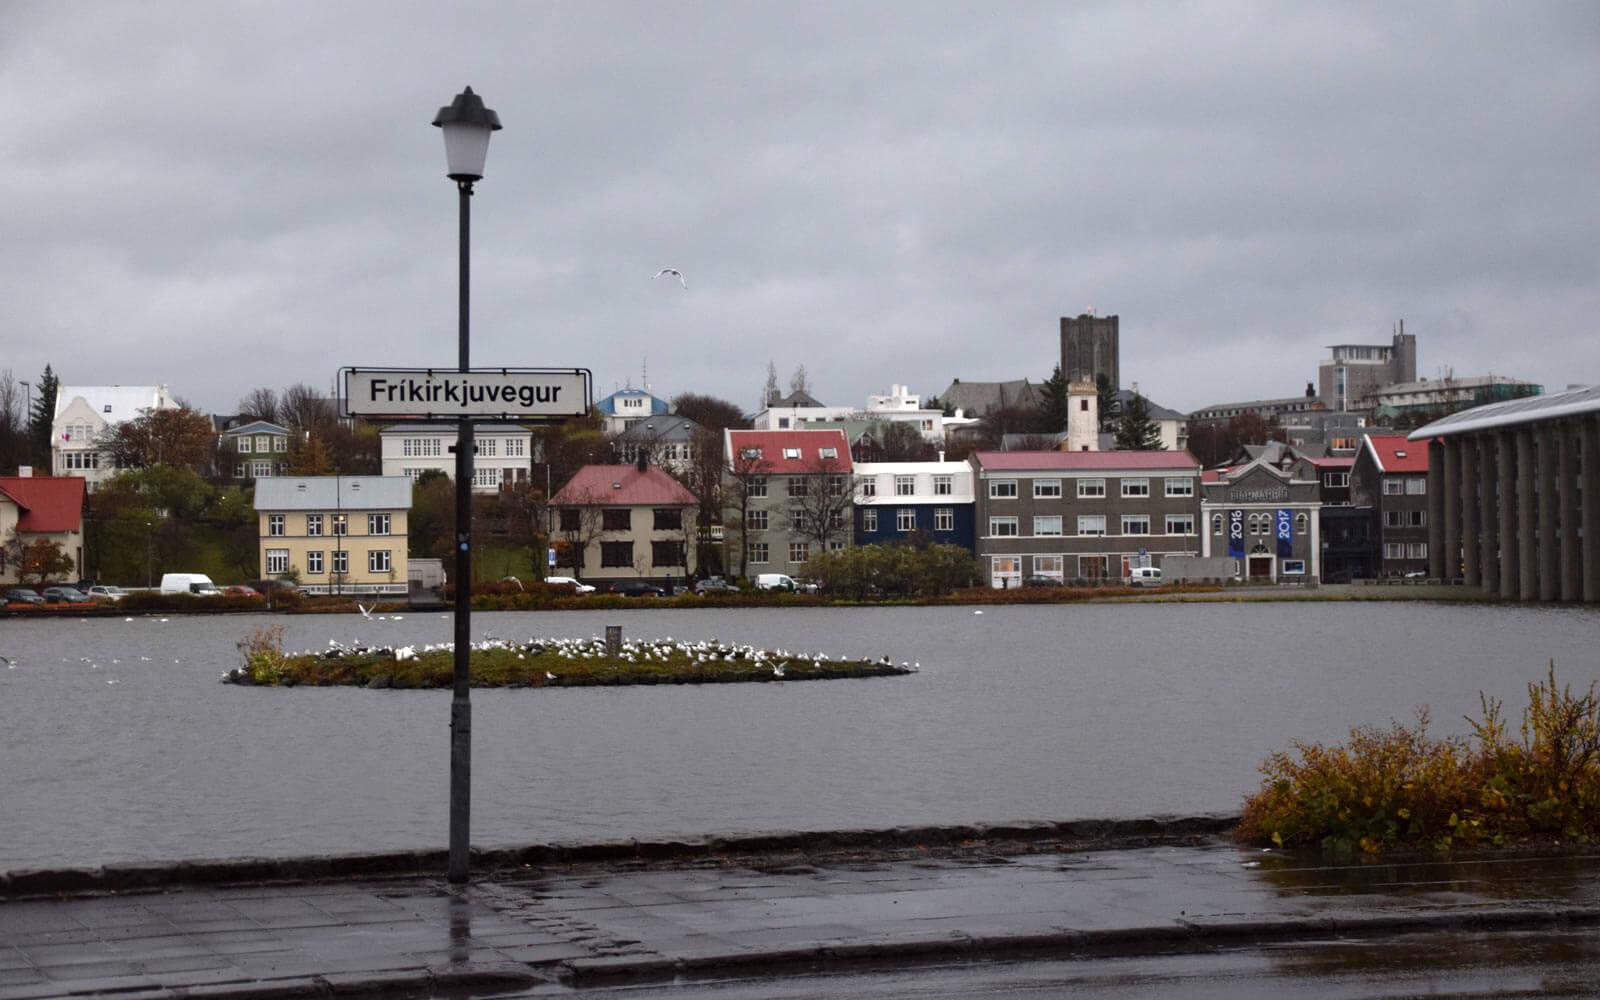 Krikirkjuvegur in Reykjavik